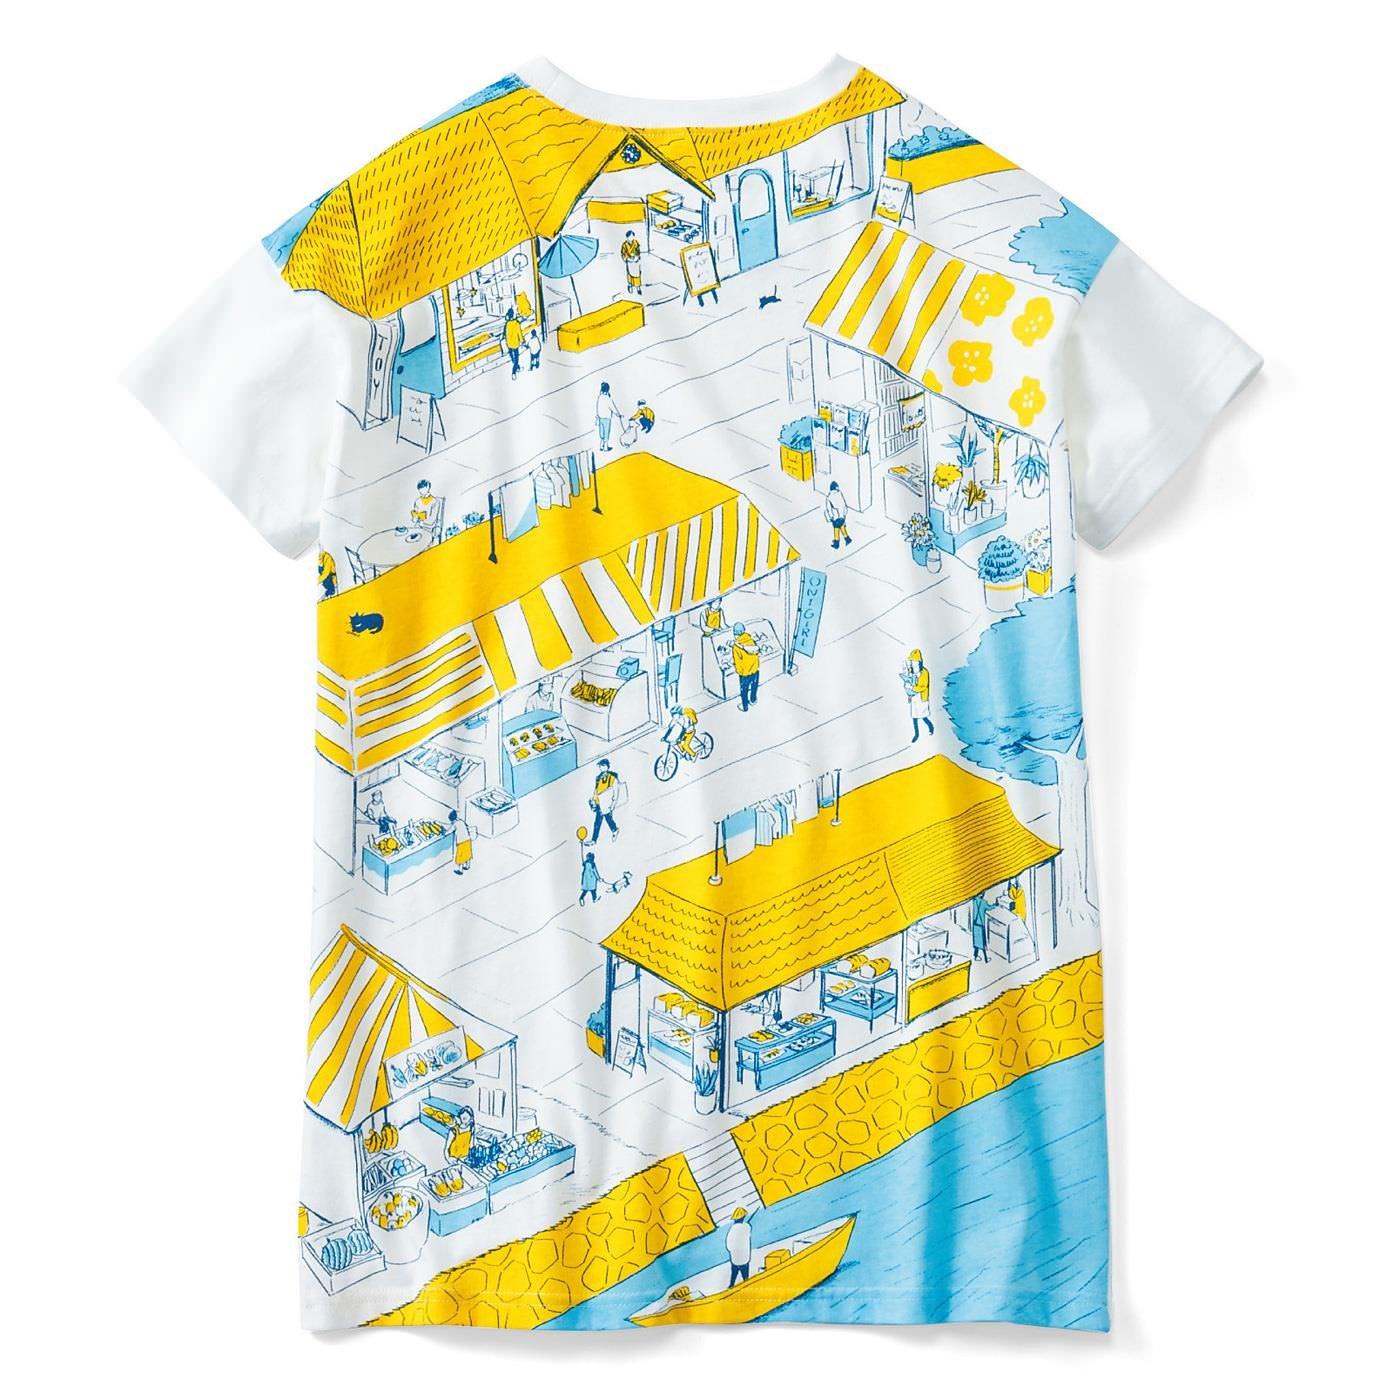 YOU+MORE! 寝ころび保育 パパドーロTシャツ〈港のお店屋さん〉